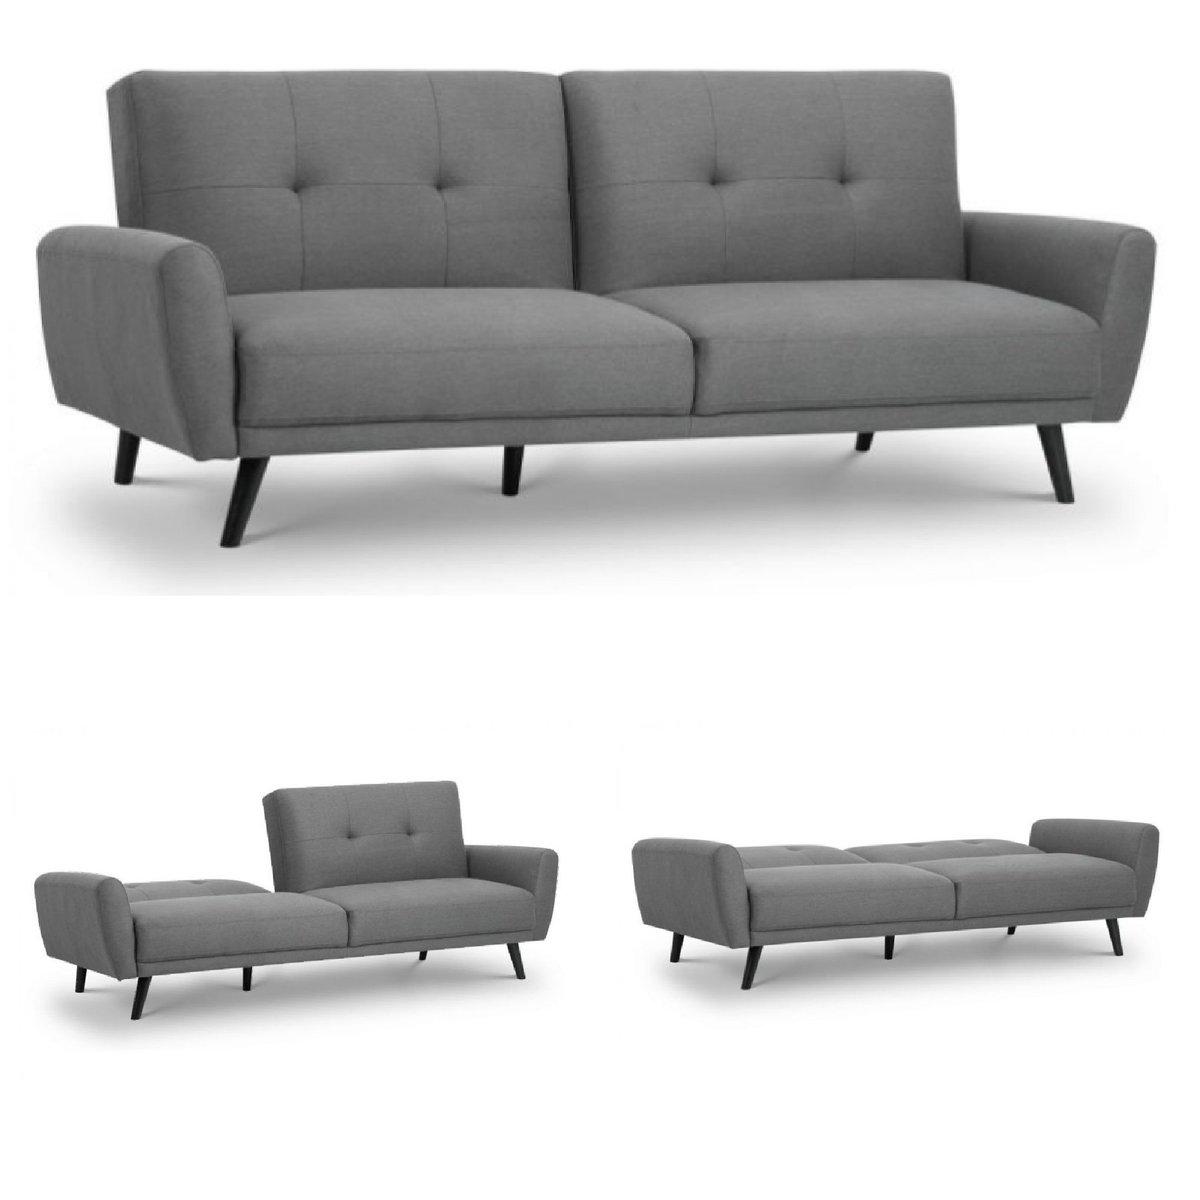 Pleasing Balhambeds Hashtag On Twitter Machost Co Dining Chair Design Ideas Machostcouk